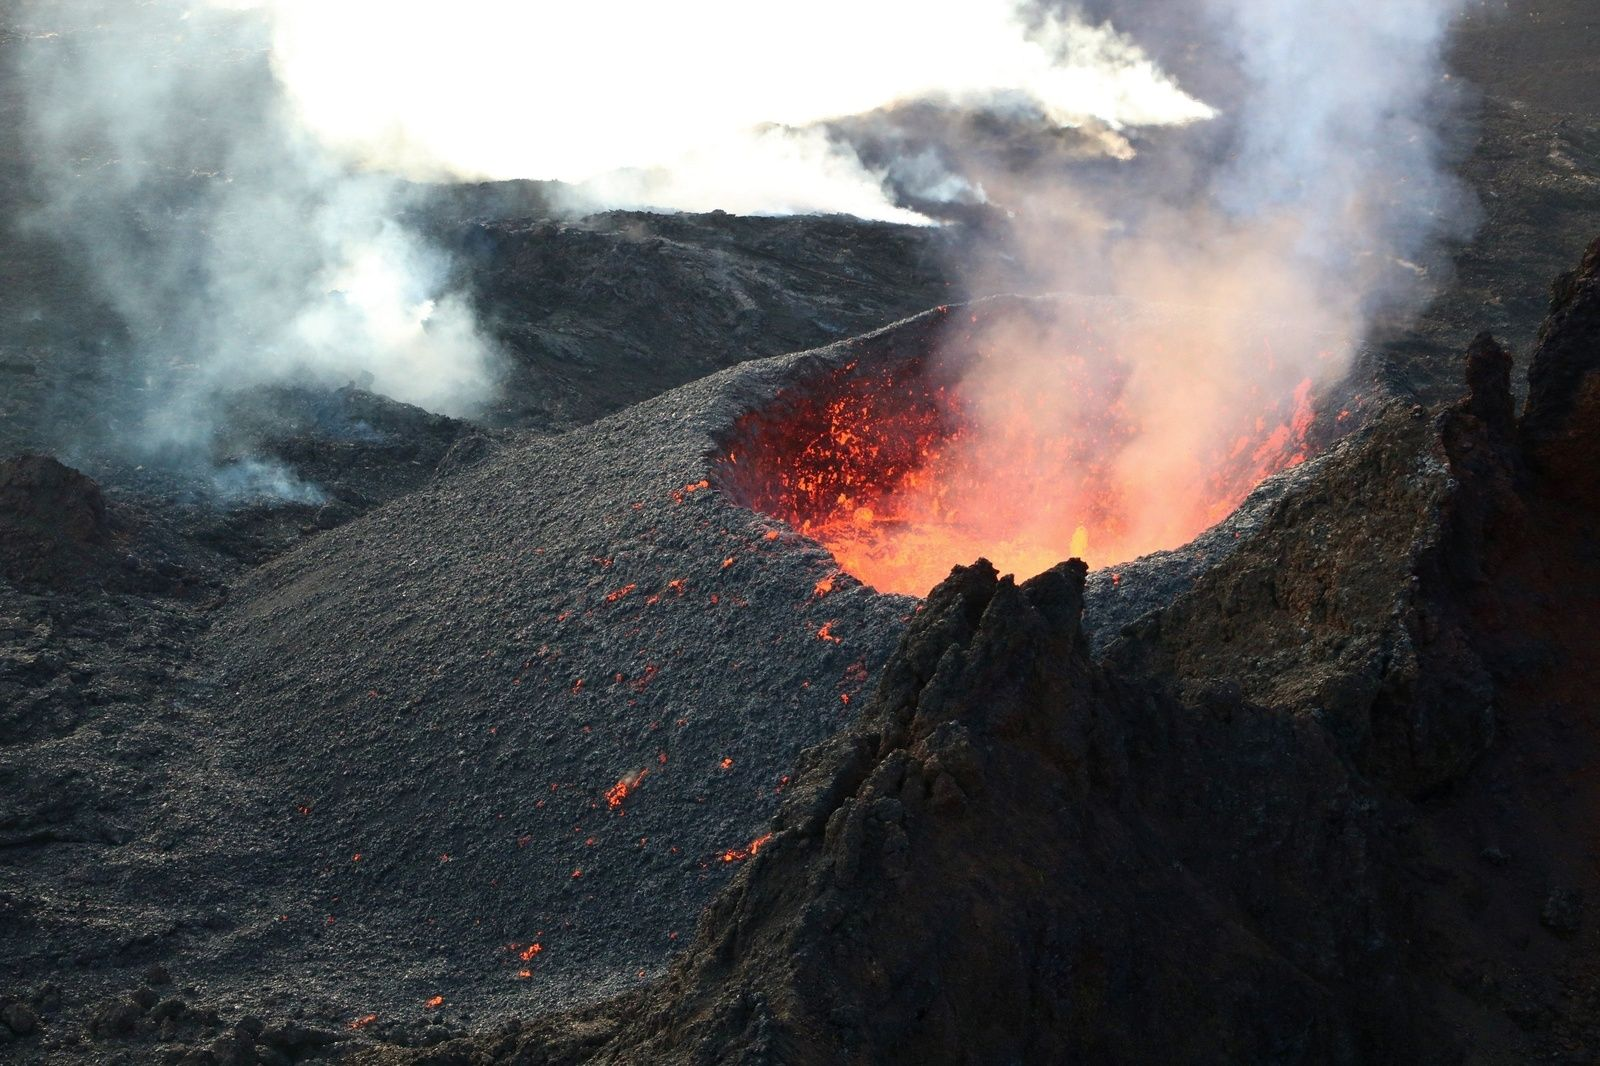 Piton De La Fournaise The Piton Named Lo Rwa Kaf Photo Ovpf During His Activity On 05 03 2019 Volcano Volcanology World